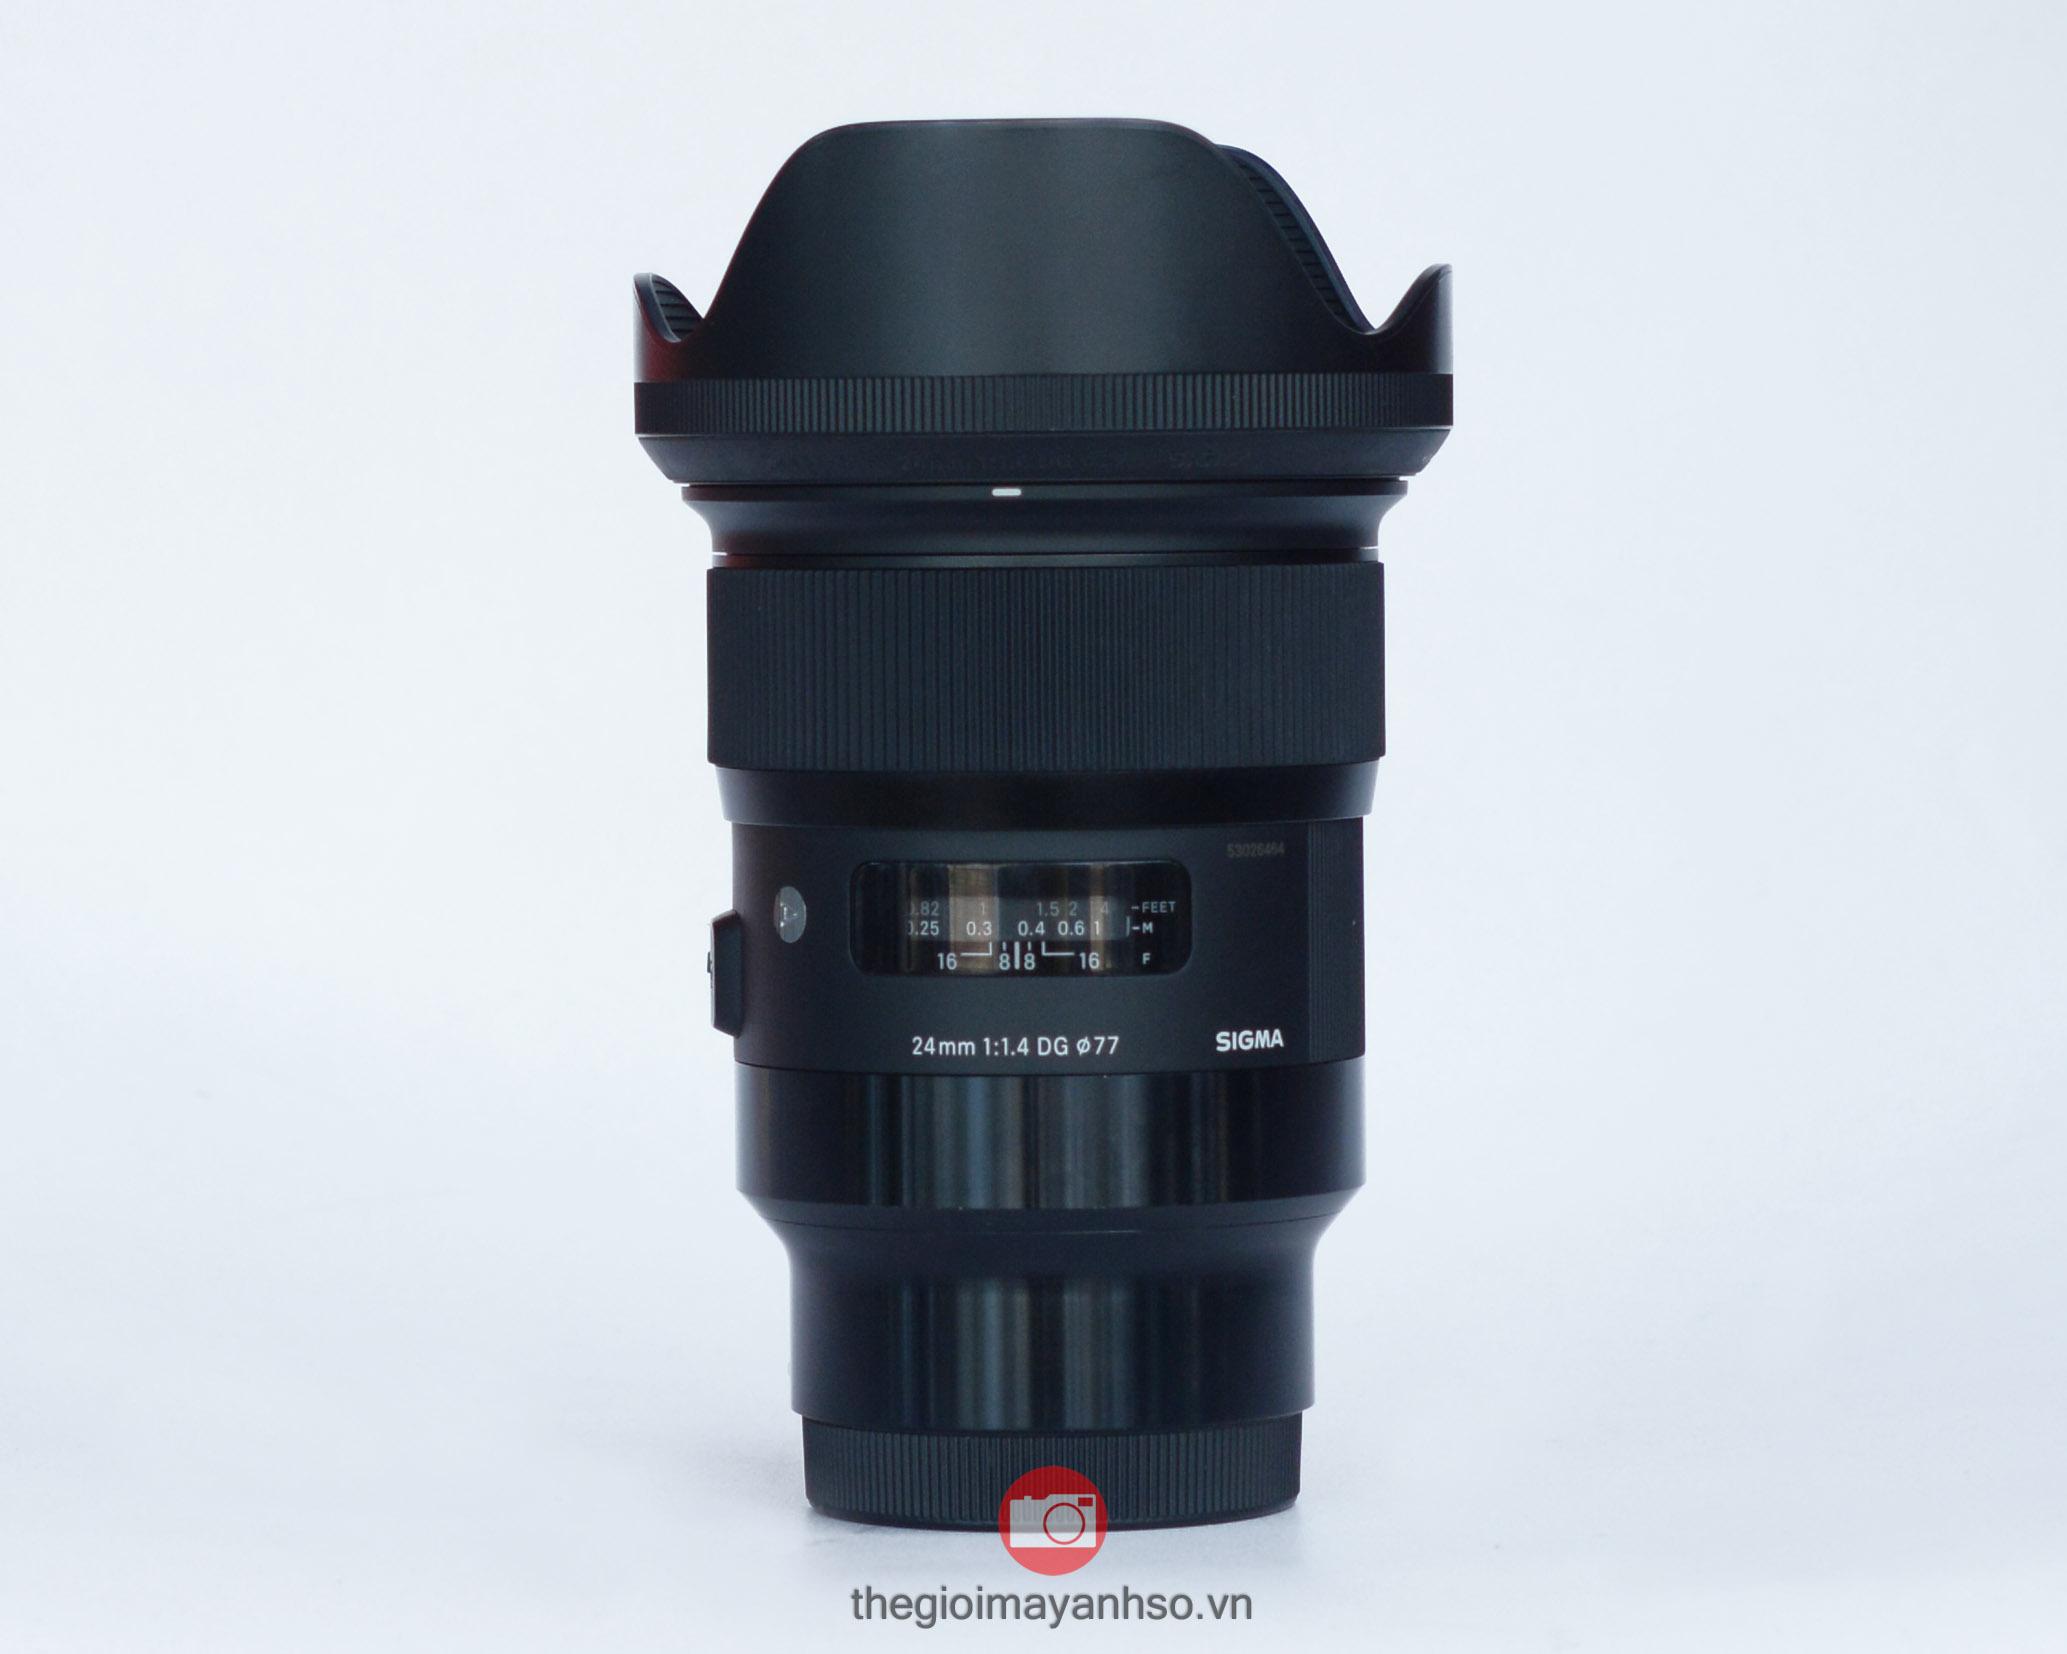 Sigma 24mm f/1.4 DG HSM Art For Sony E